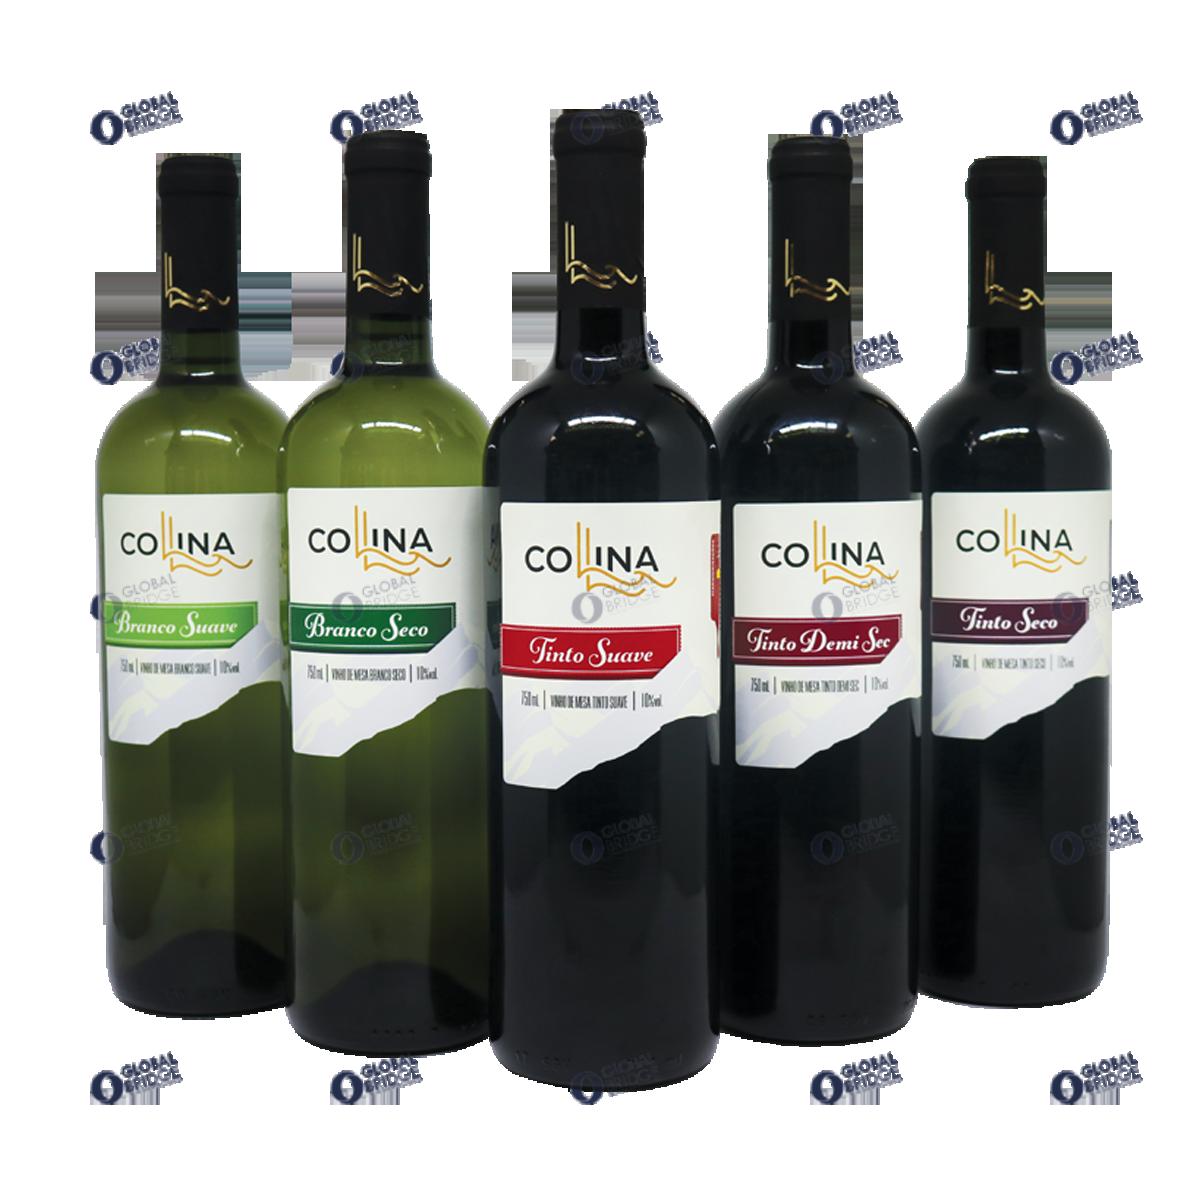 Wine Demi Sec Red Collina Made in Brazil 750 ml Bottle American Grapes Winemaker Drink Alcoholic Beverage Grapes Wine Vinho